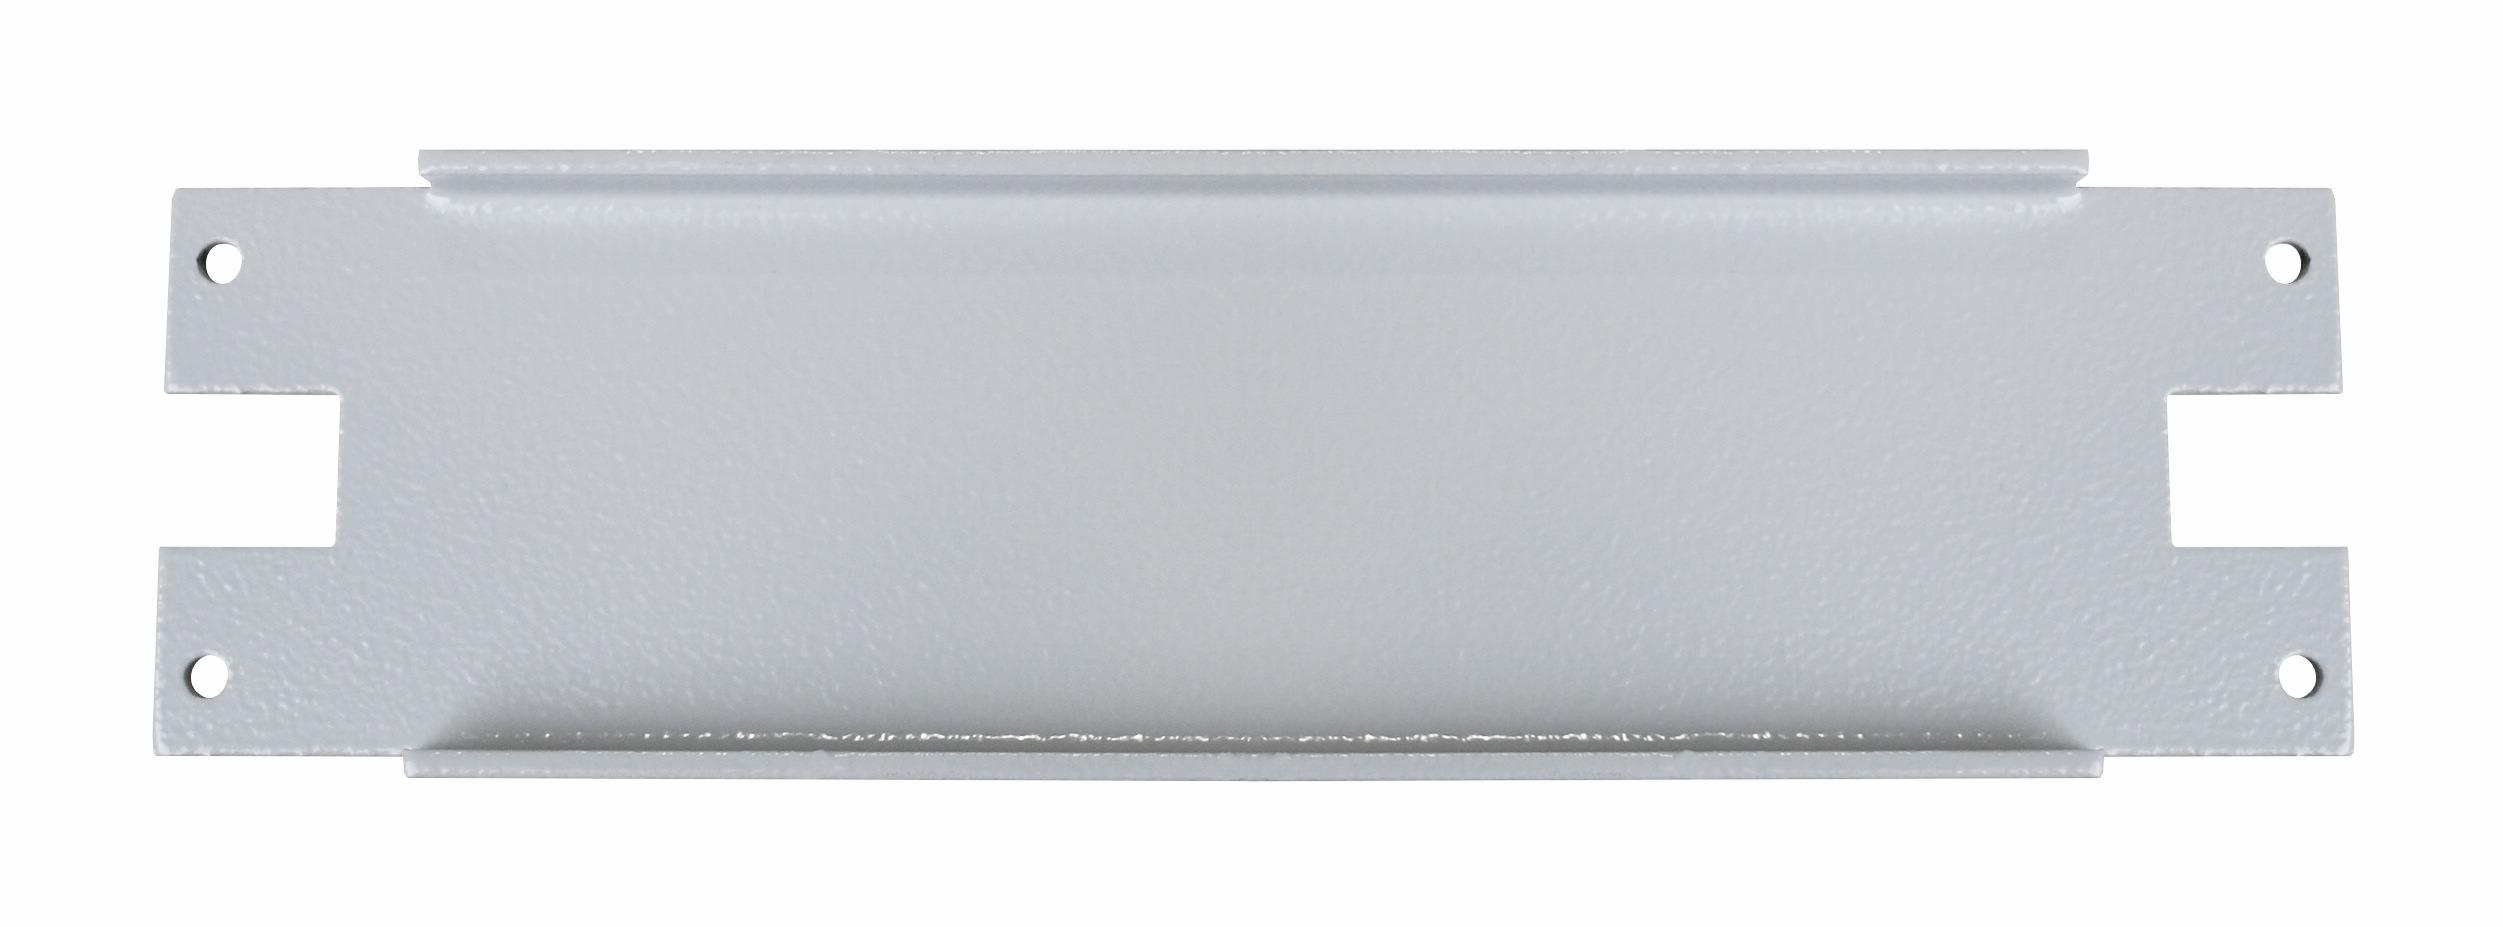 1 Stk Montageplatte 1ZP, 240x70x13mm IL080109-G